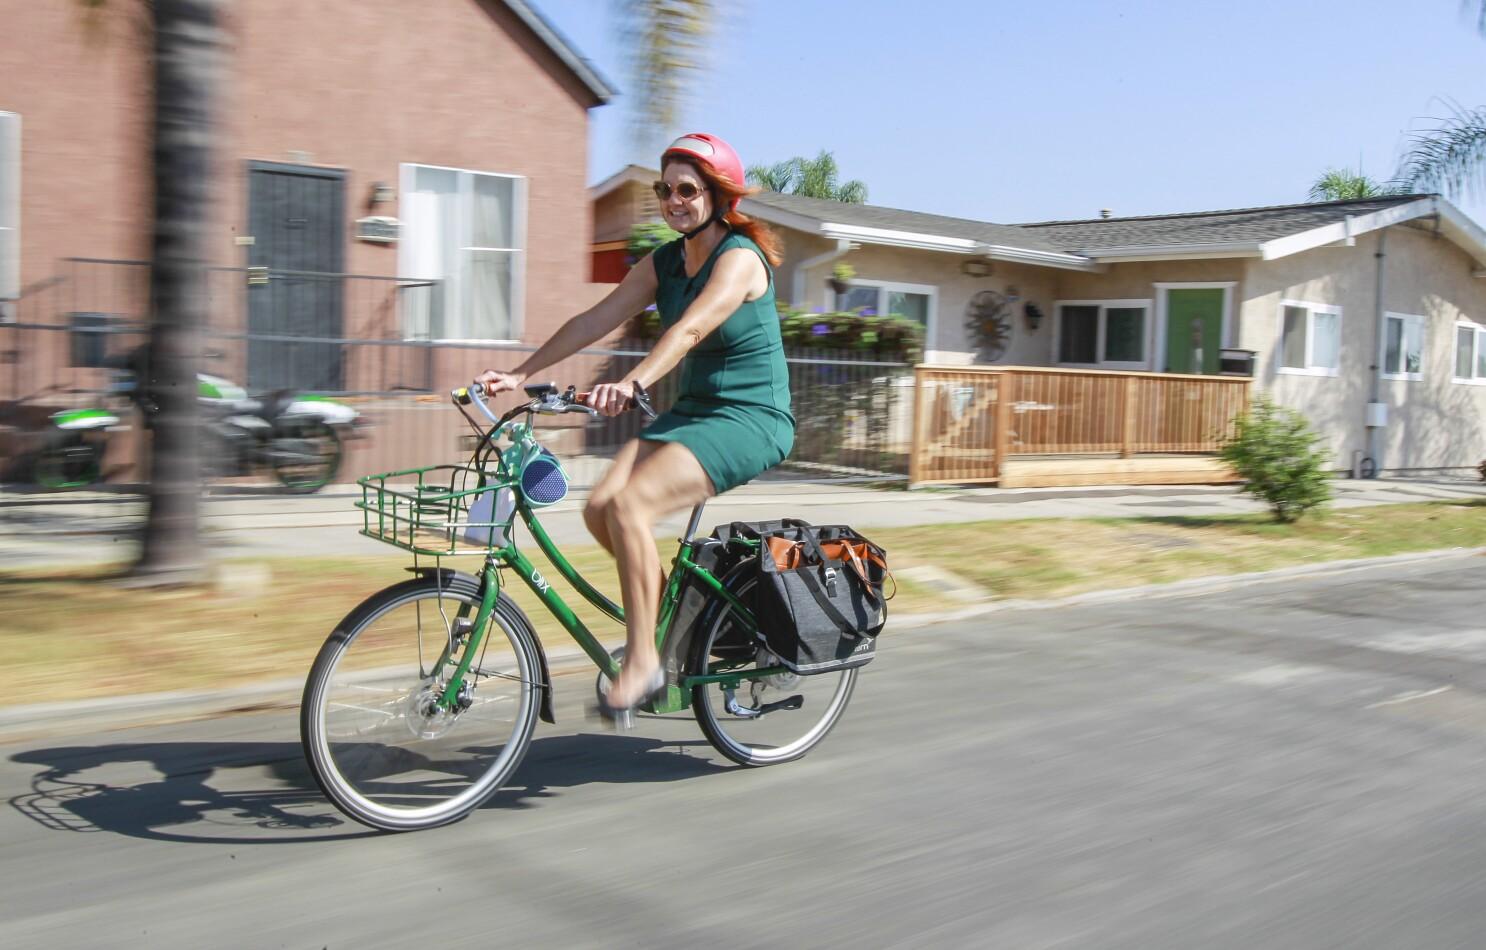 How Nicole Capretz became the climate-change maven of San Diego